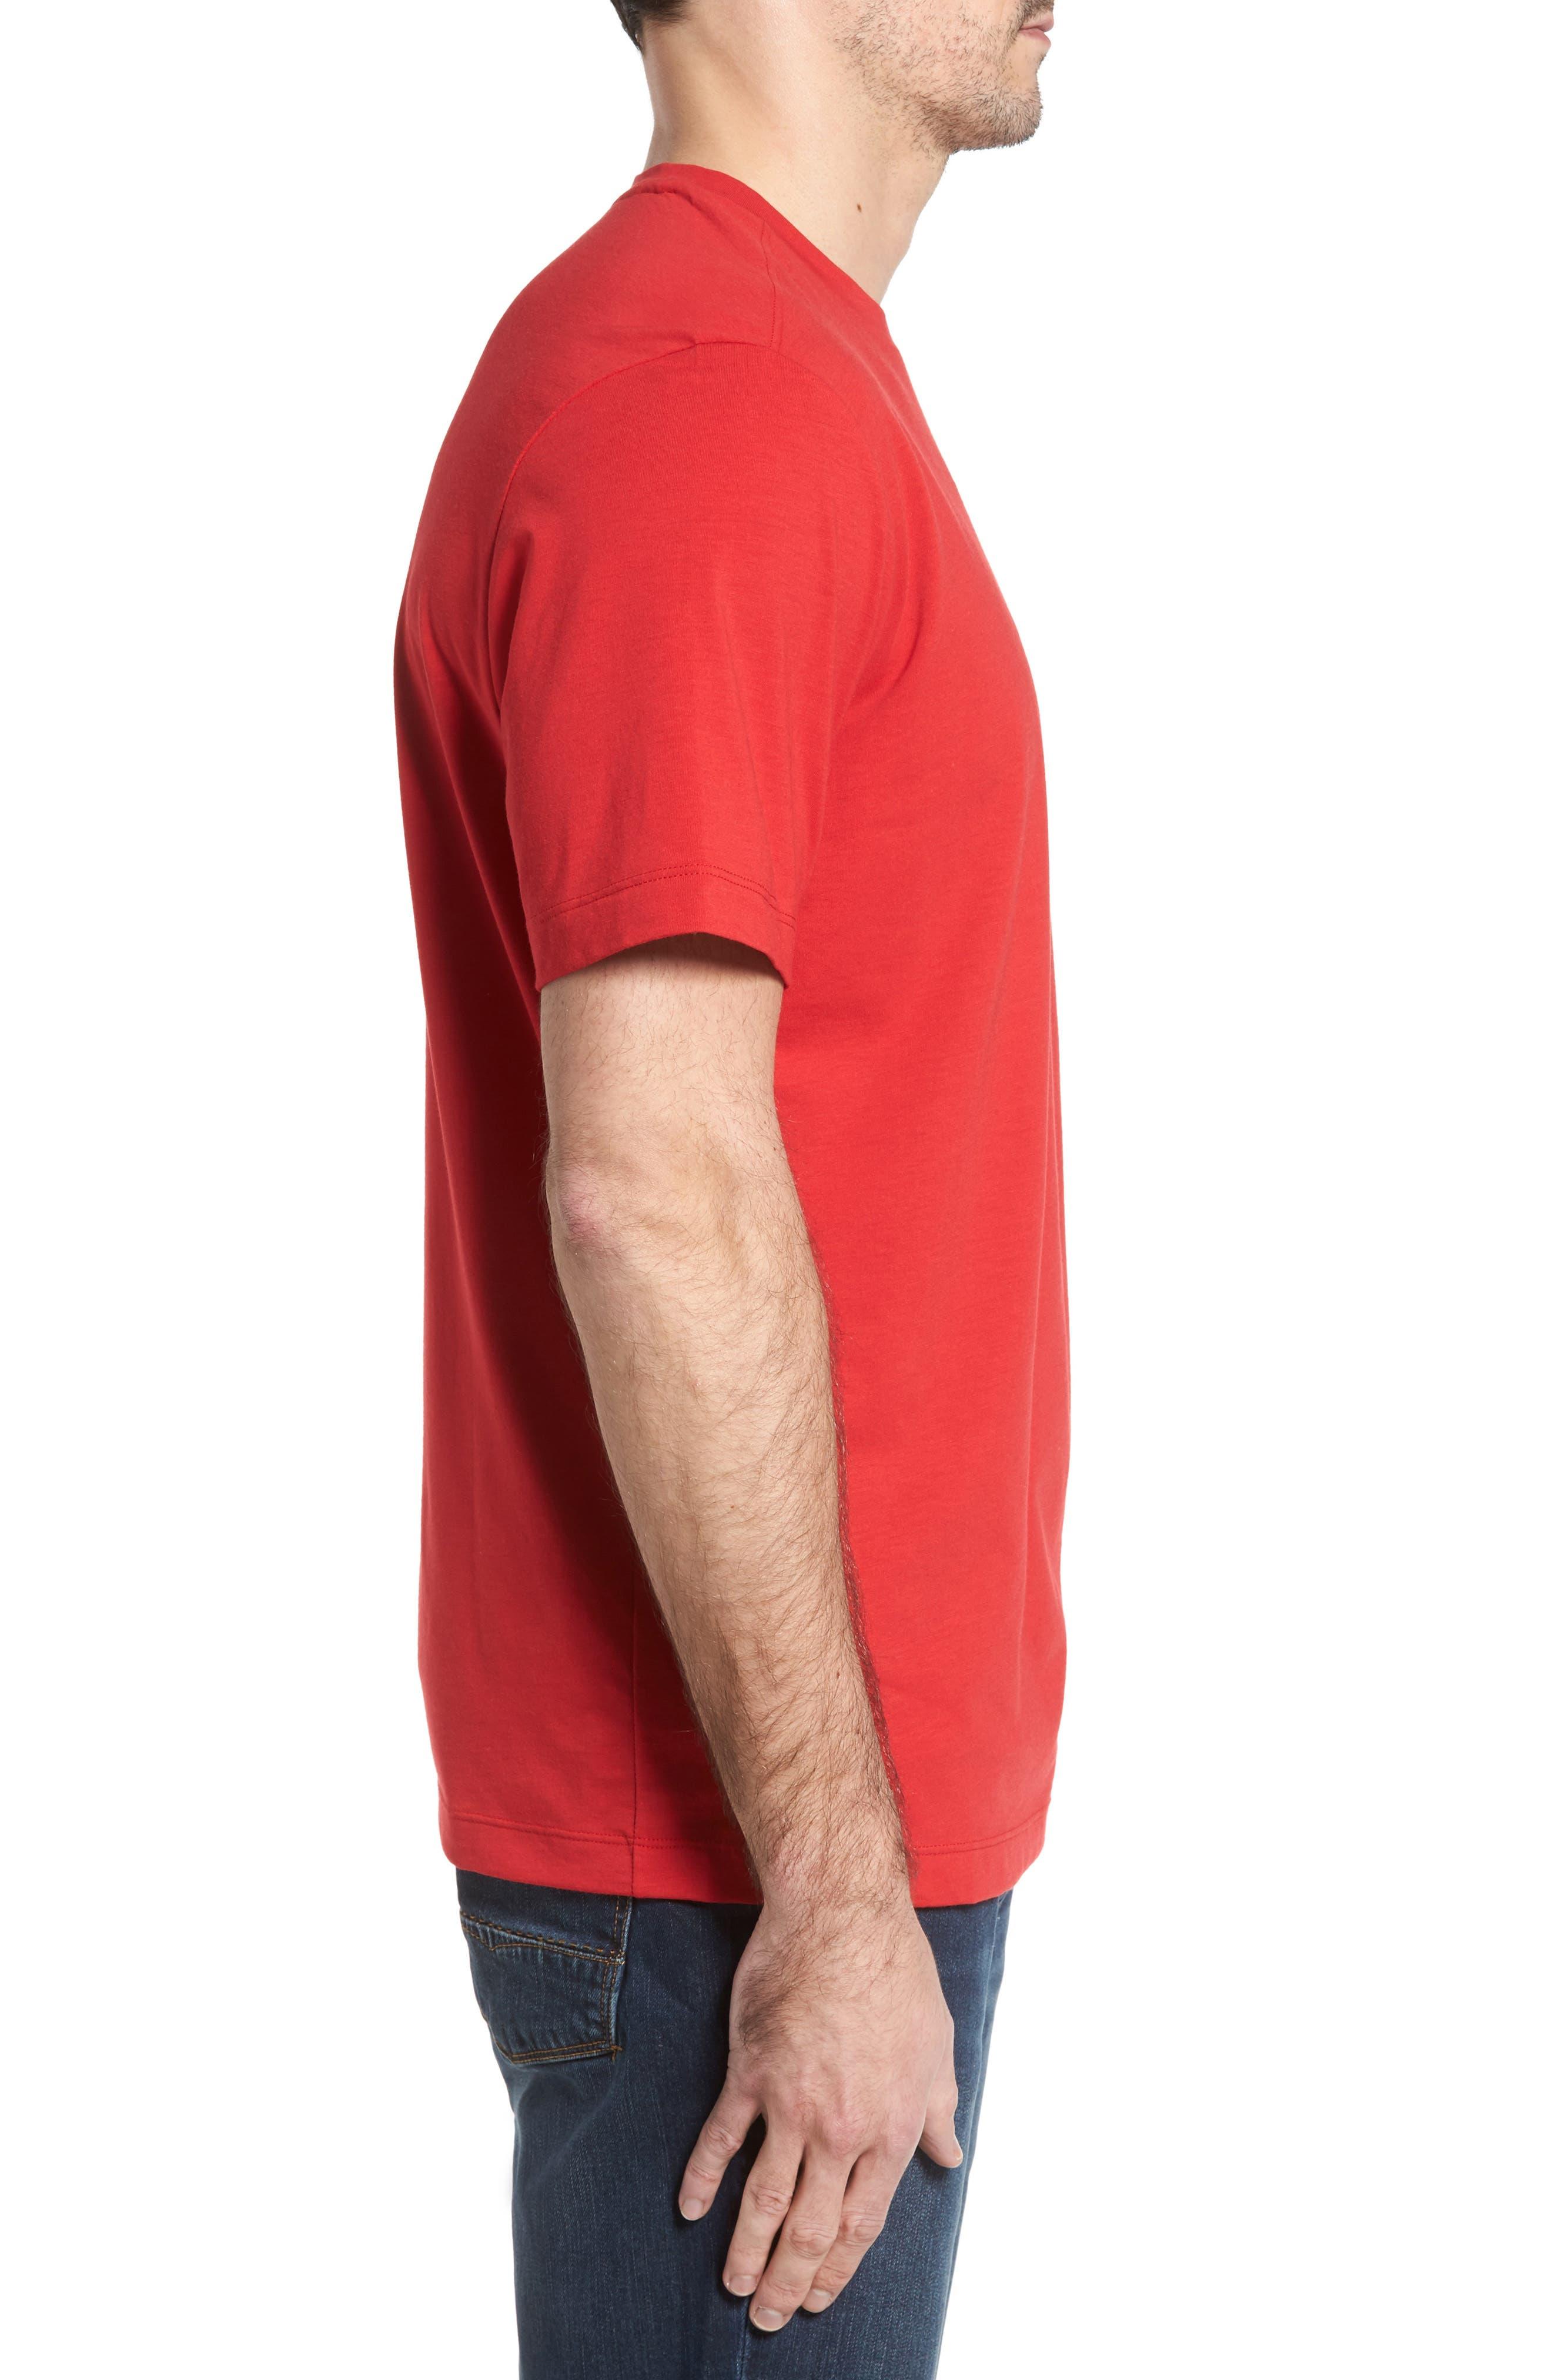 Tropicool T-Shirt,                             Alternate thumbnail 29, color,